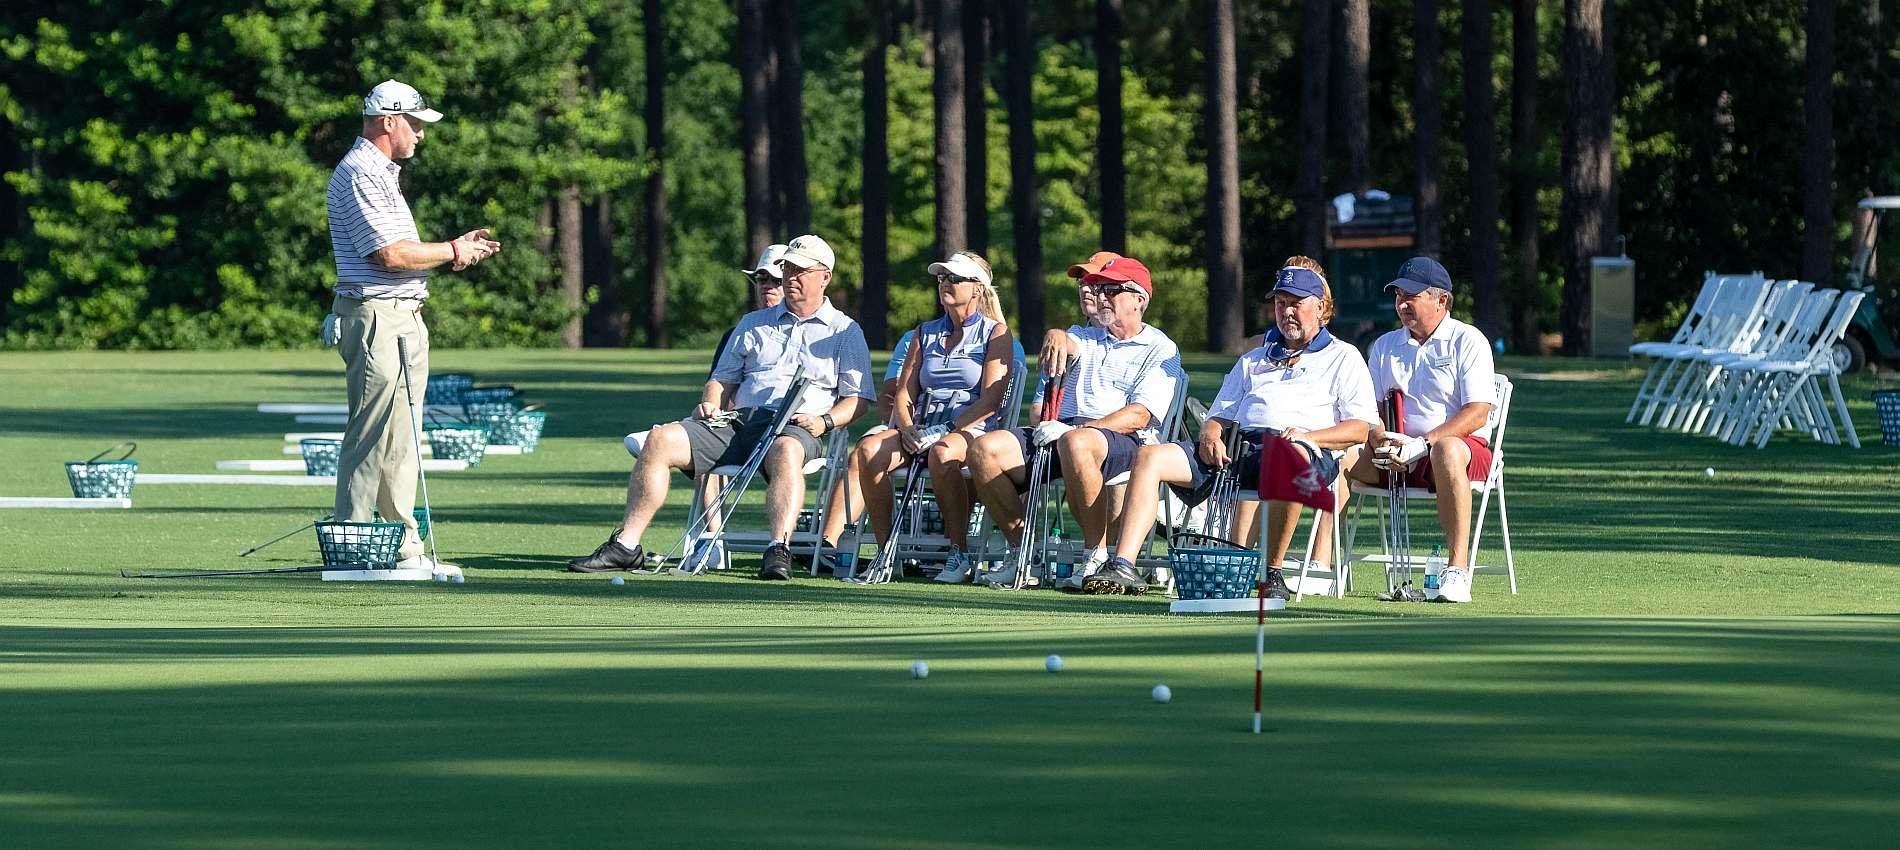 Golf Academy Corporate